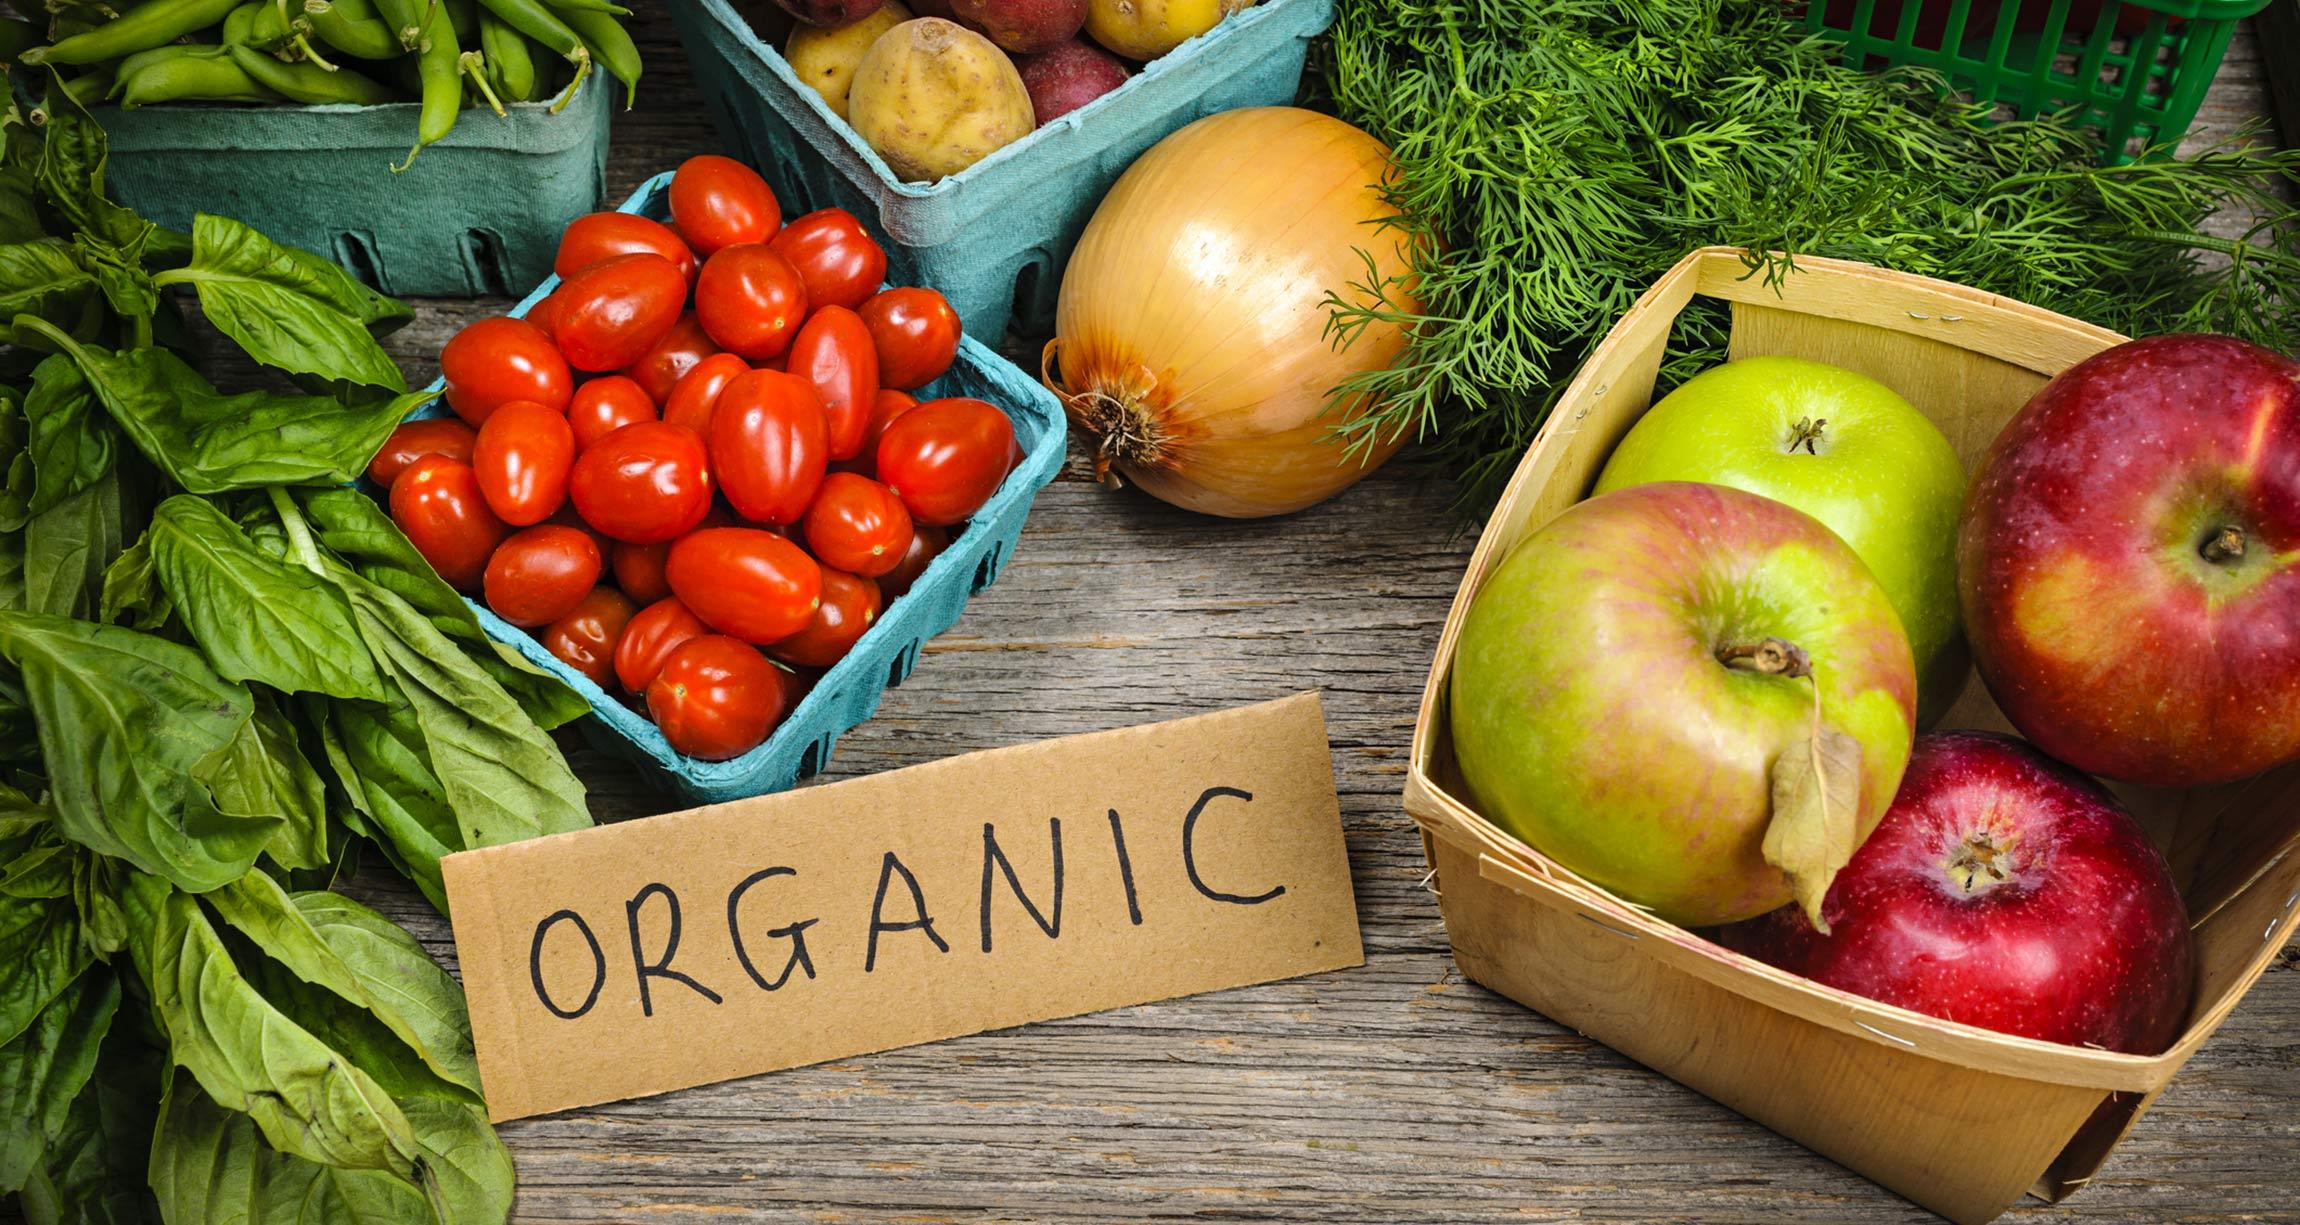 blog-featured-organicandcancer-20181120.jpg